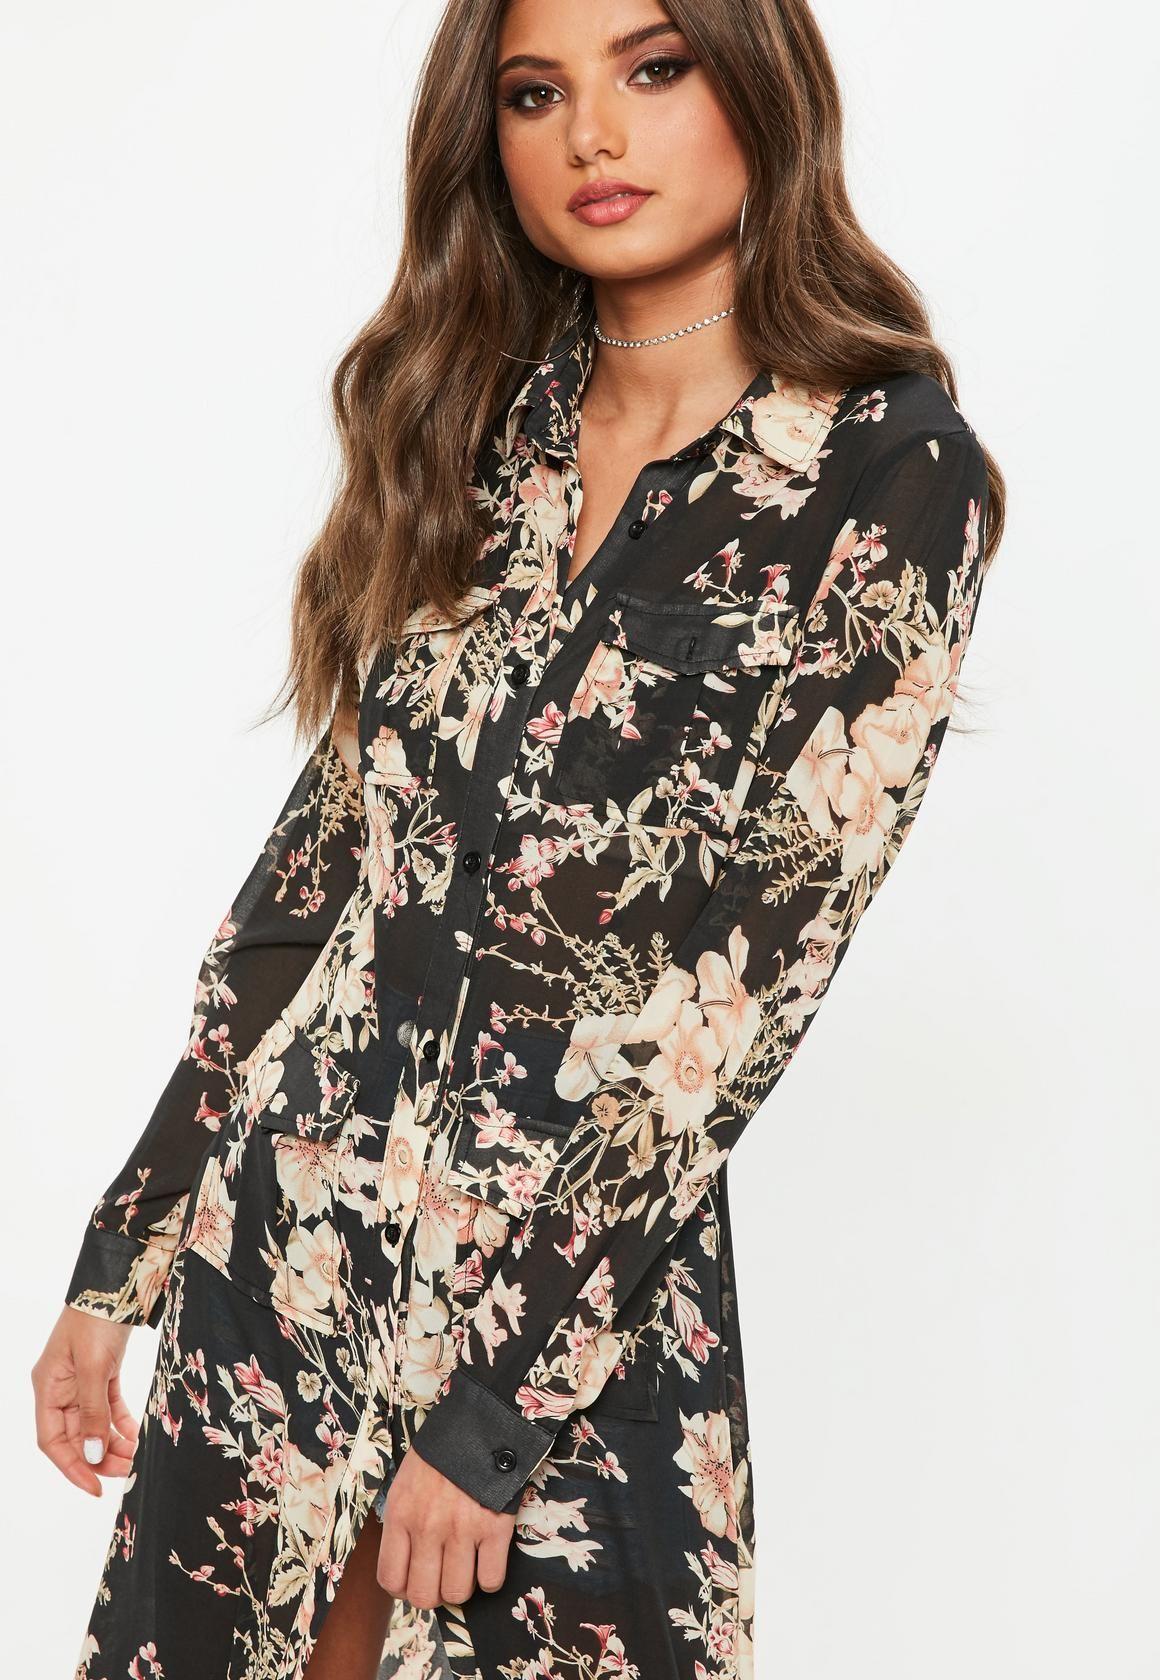 cedb1565ee Missguided - Vestido camisero largo de manga larga con flores en negro